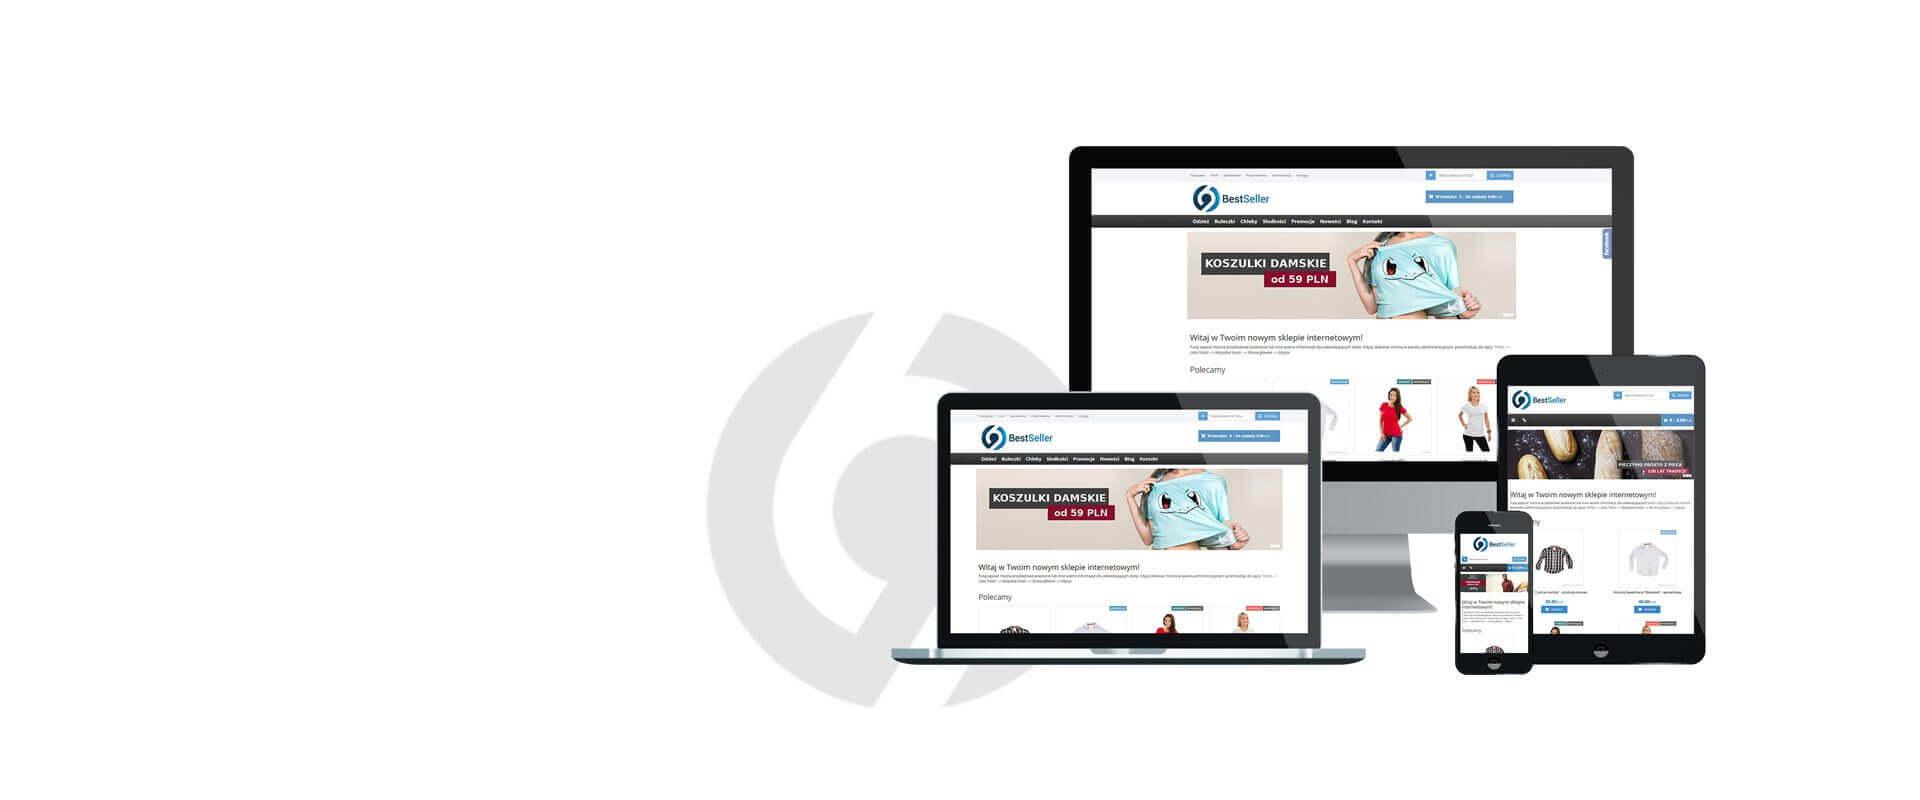 bd63106adcf23 Oprogramowanie sklepu internetowego - program BestSeller ®